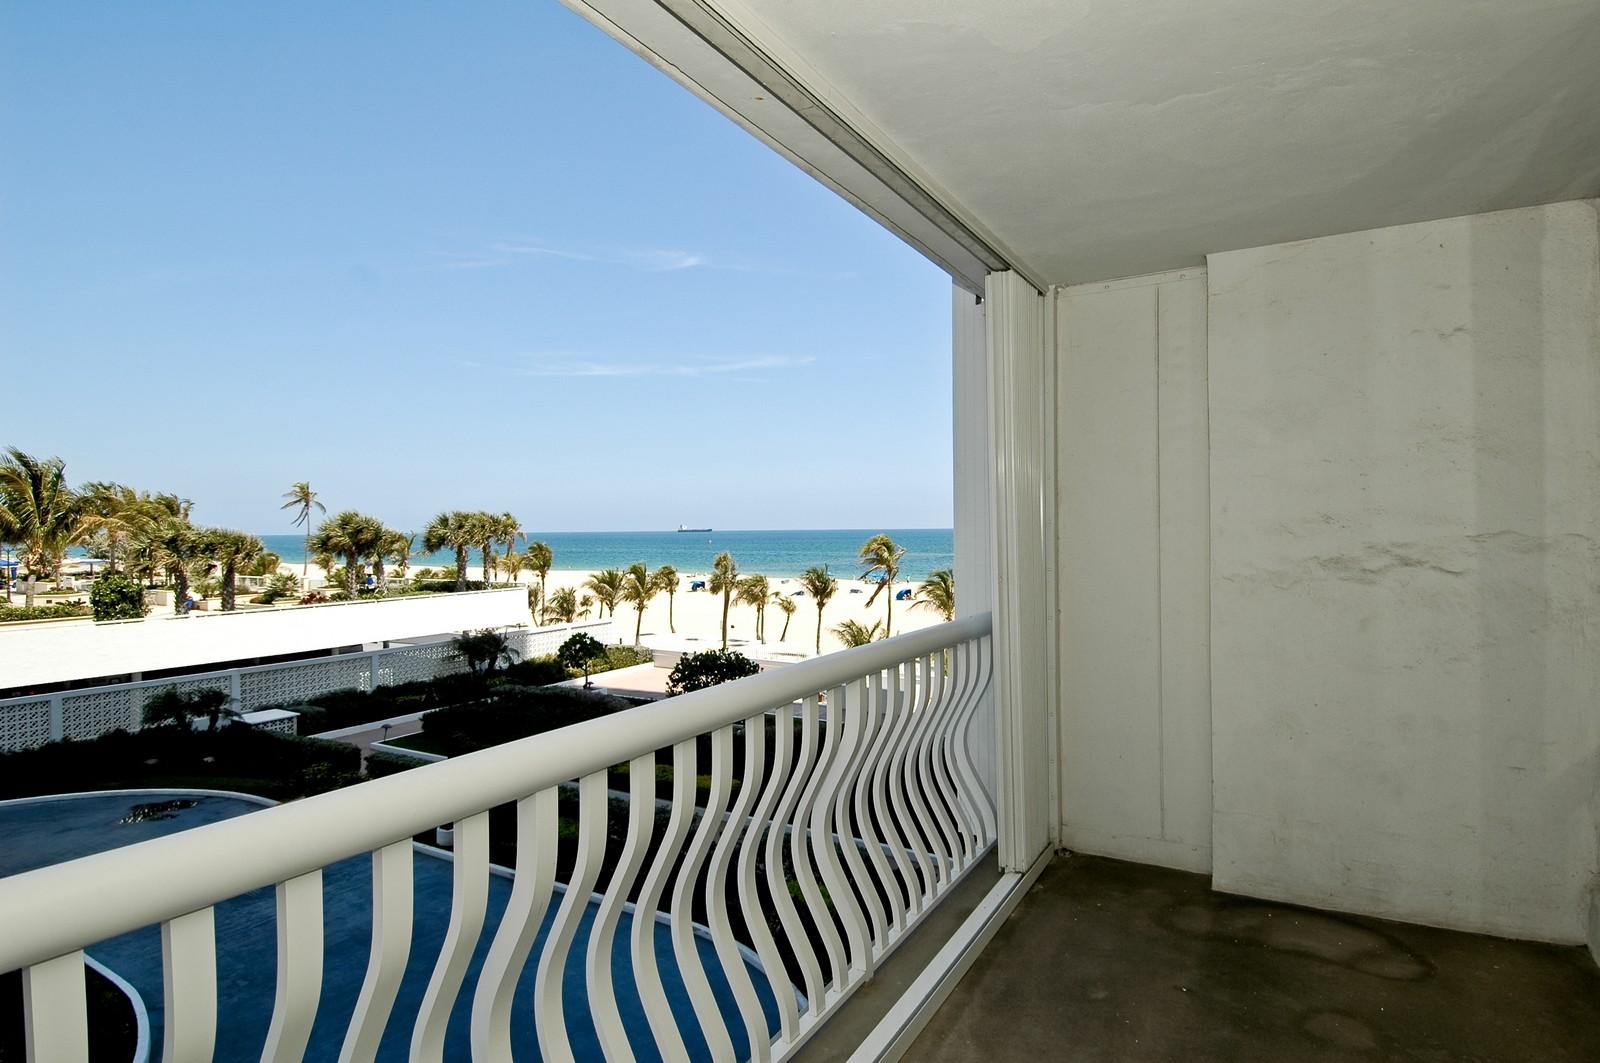 Real Estate Photography - 2200 S Ocean Ln, 206, Fort Lauderdale, FL, 33316 - Ocean View